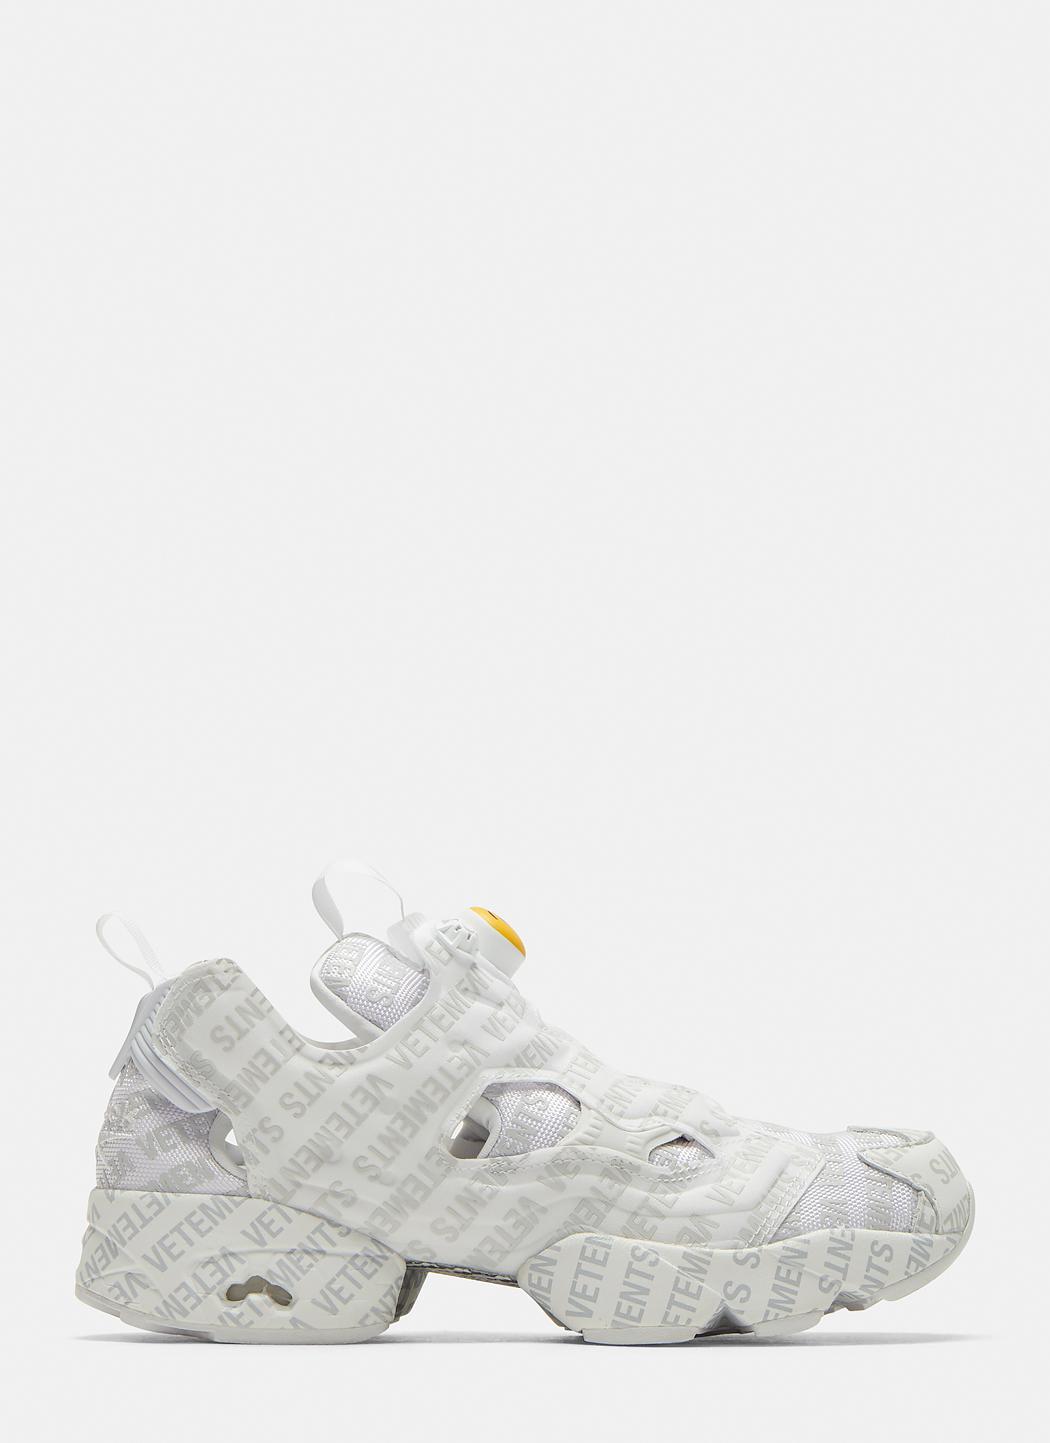 27d8b76dd31 Lyst - Vetements X Reebok Emoji Instapump Fury Sneakers In White in ...